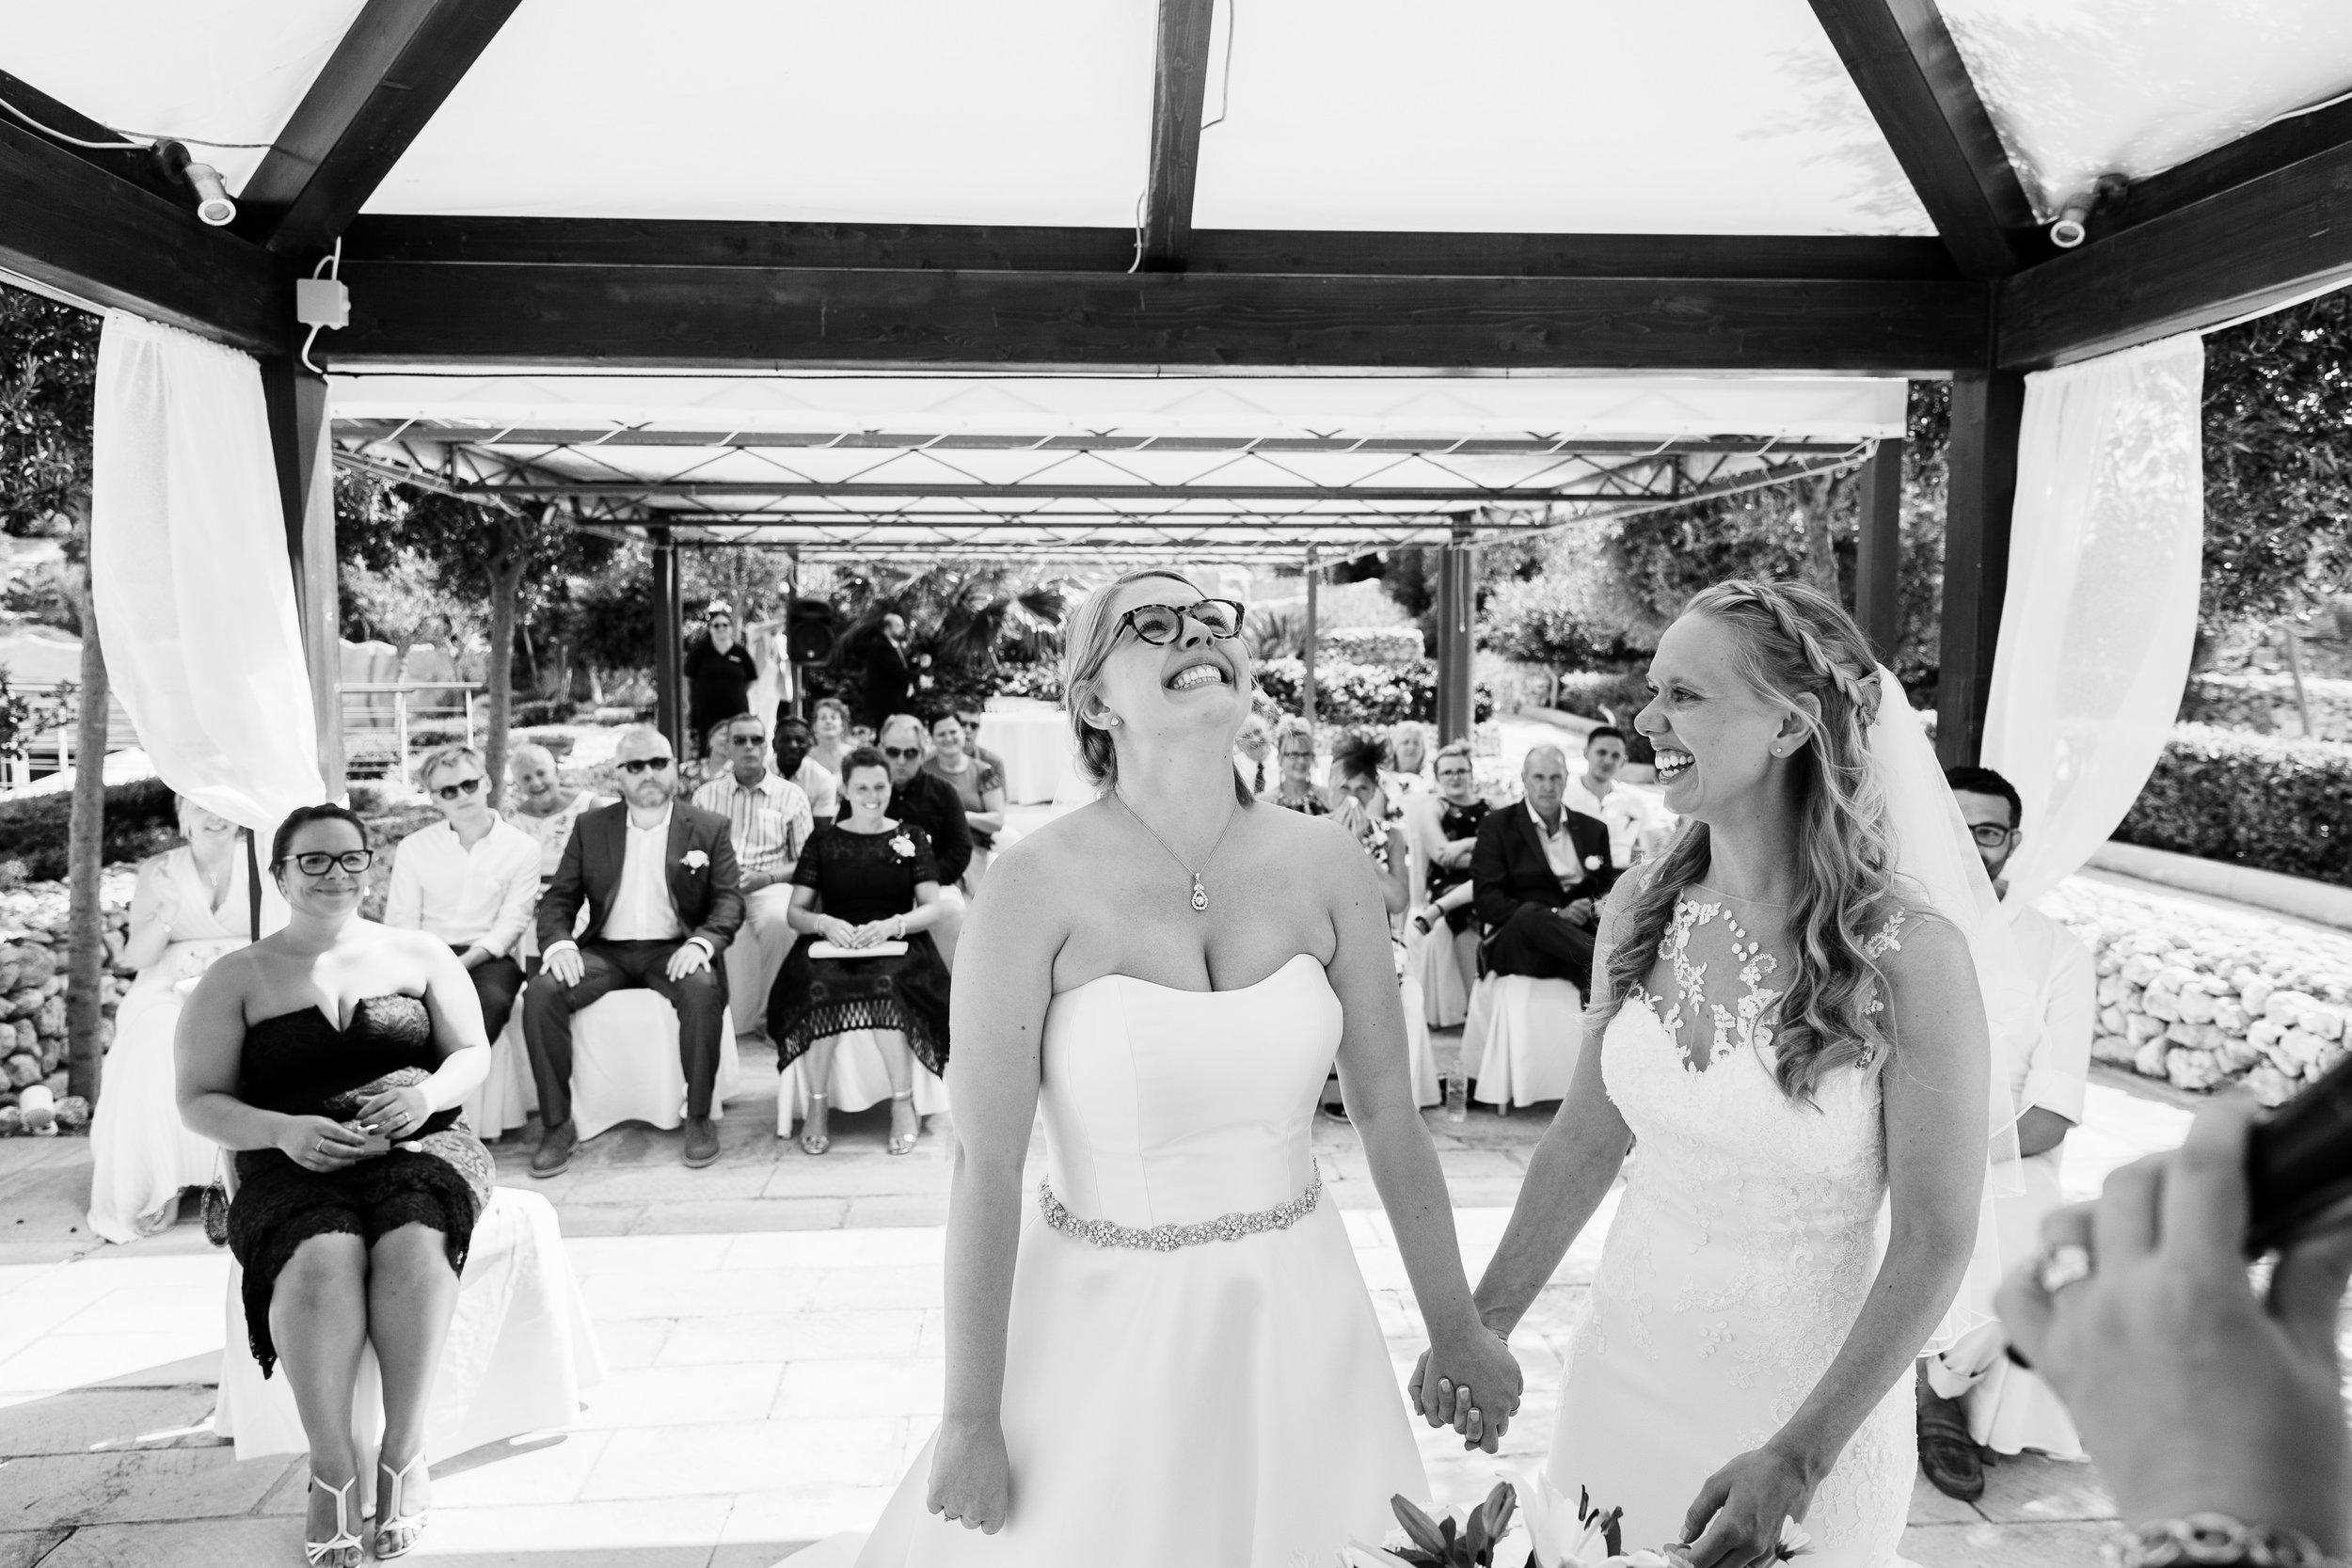 Malta_wedding_photography-64.jpg